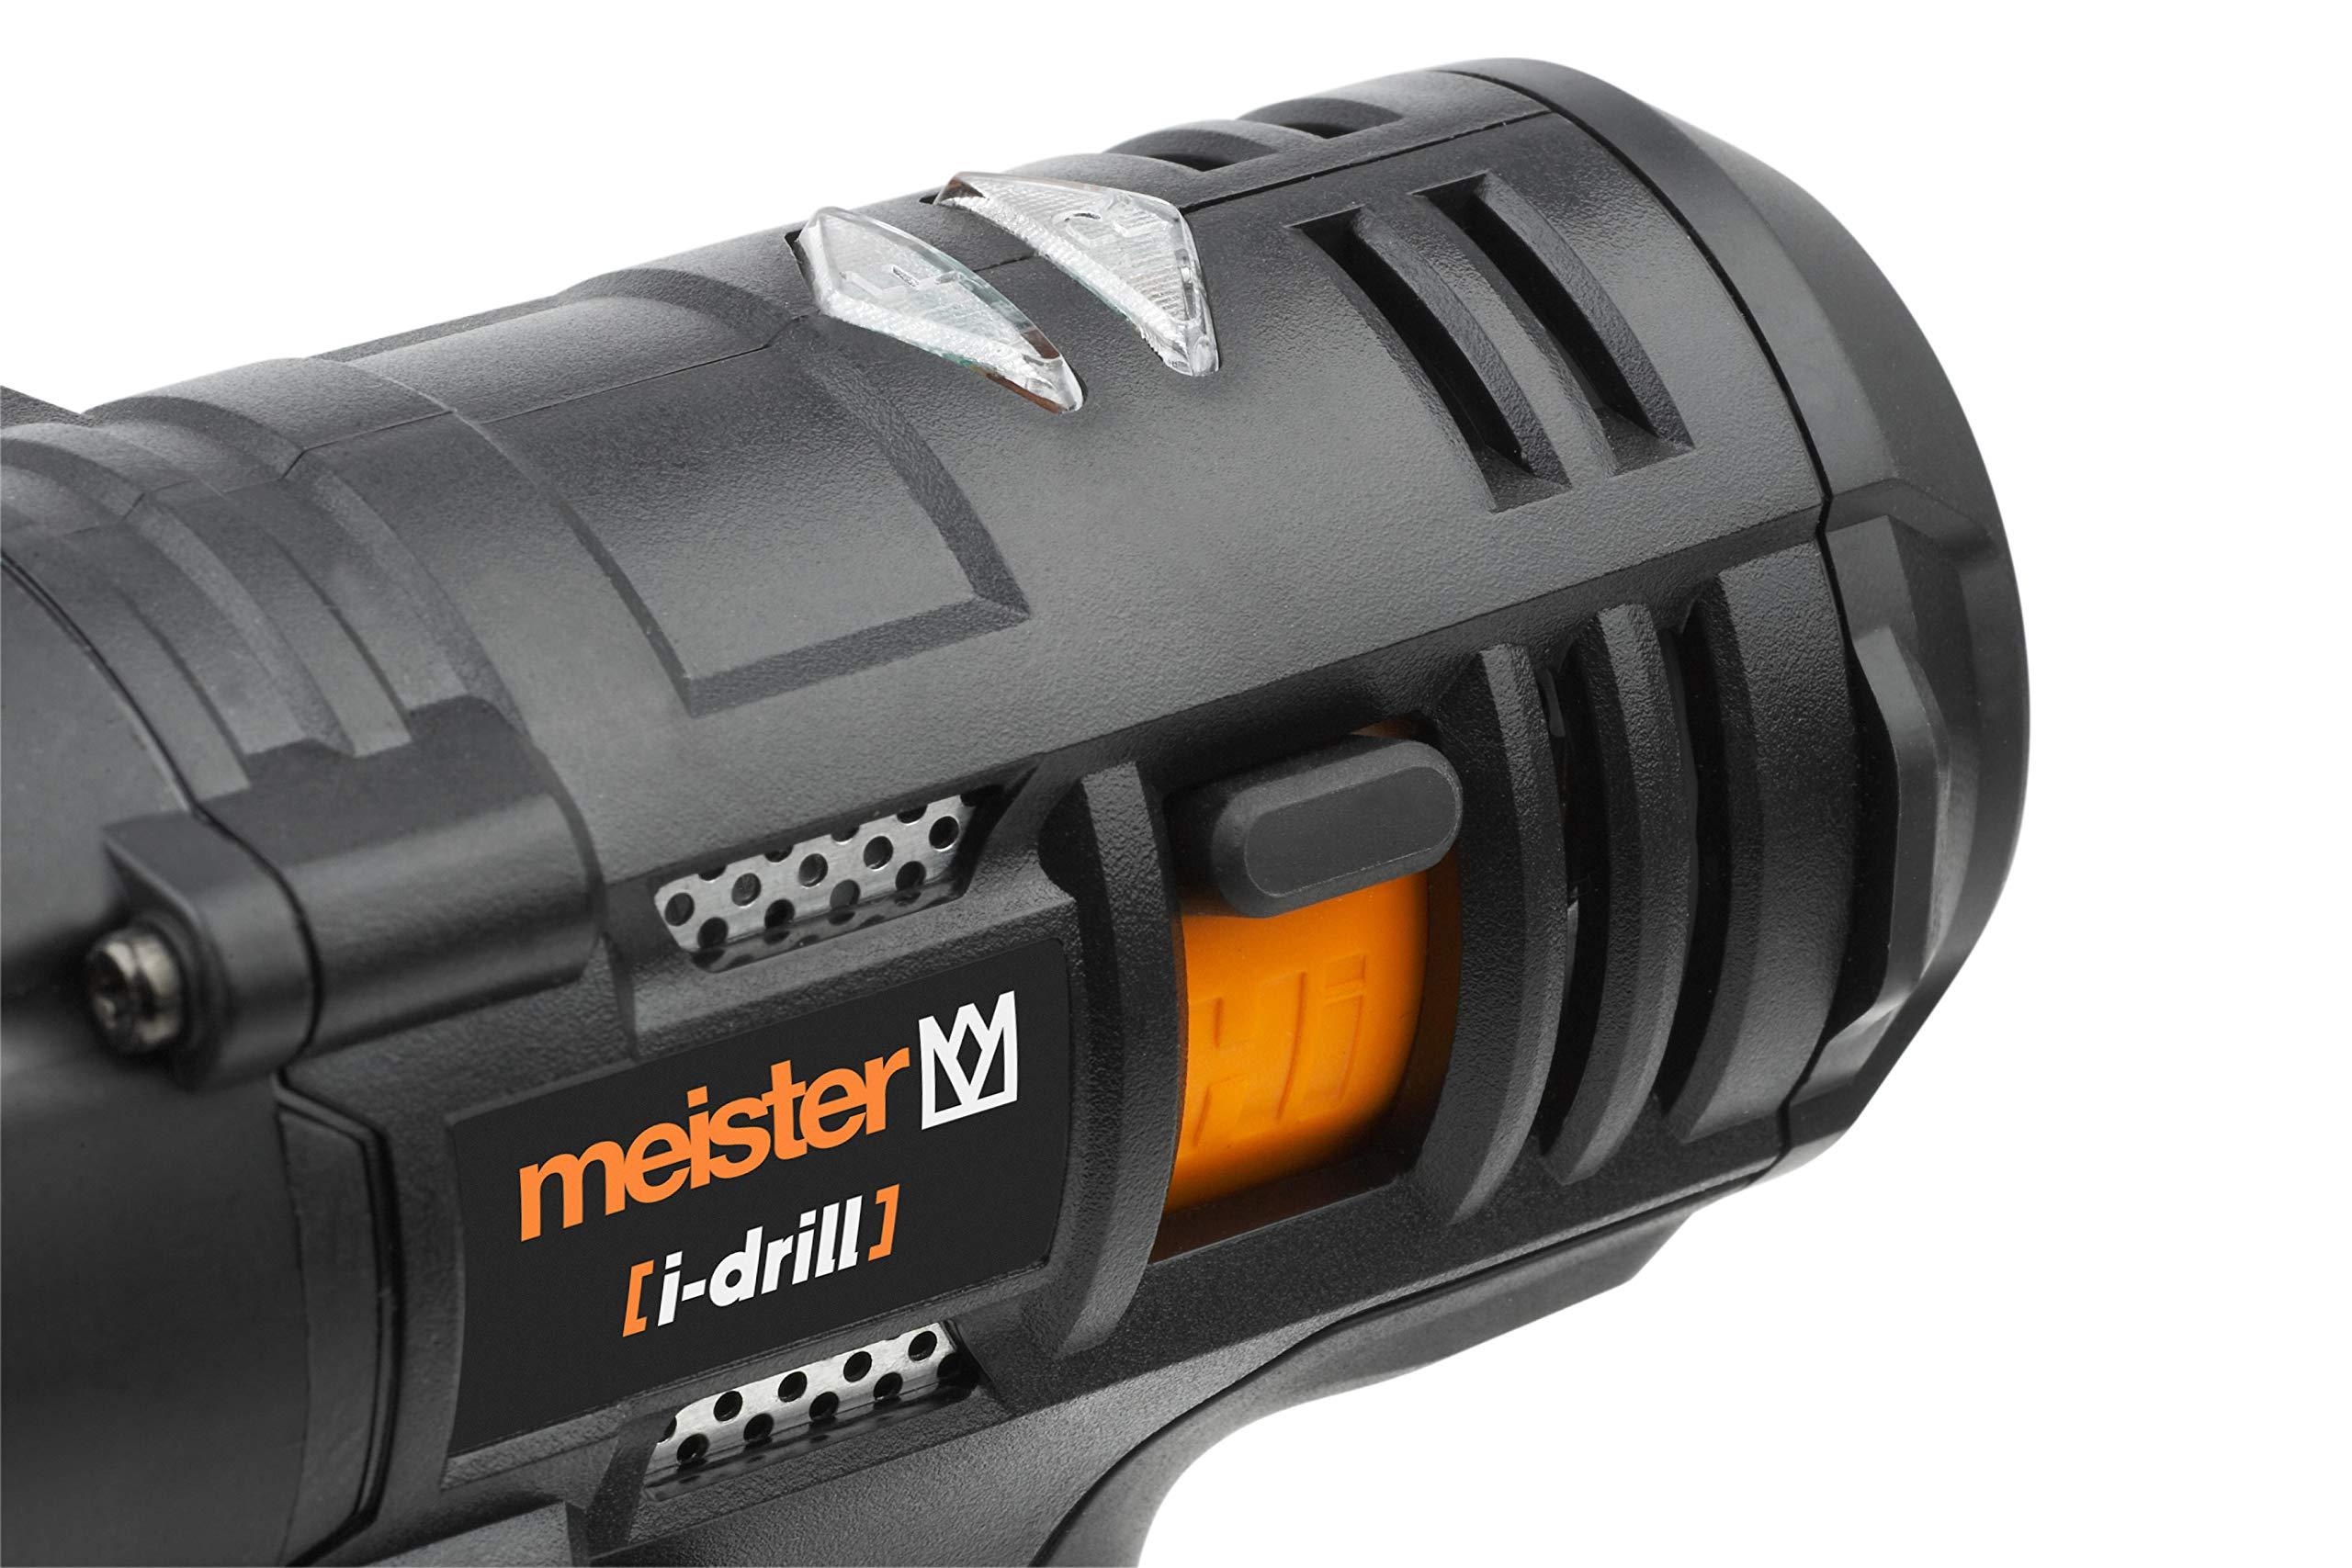 Meister-Akkubohrschrauber-i-drill-Maxx-16-V-20-Ah-Akku-2-Gang-Getriebe-Schnellspannbohrfutter-40-Nm-Drehmoment-Akkuschrauber-mit-Arbeitsleuchte-Bohrschrauber-in-Textiltasche-5450750